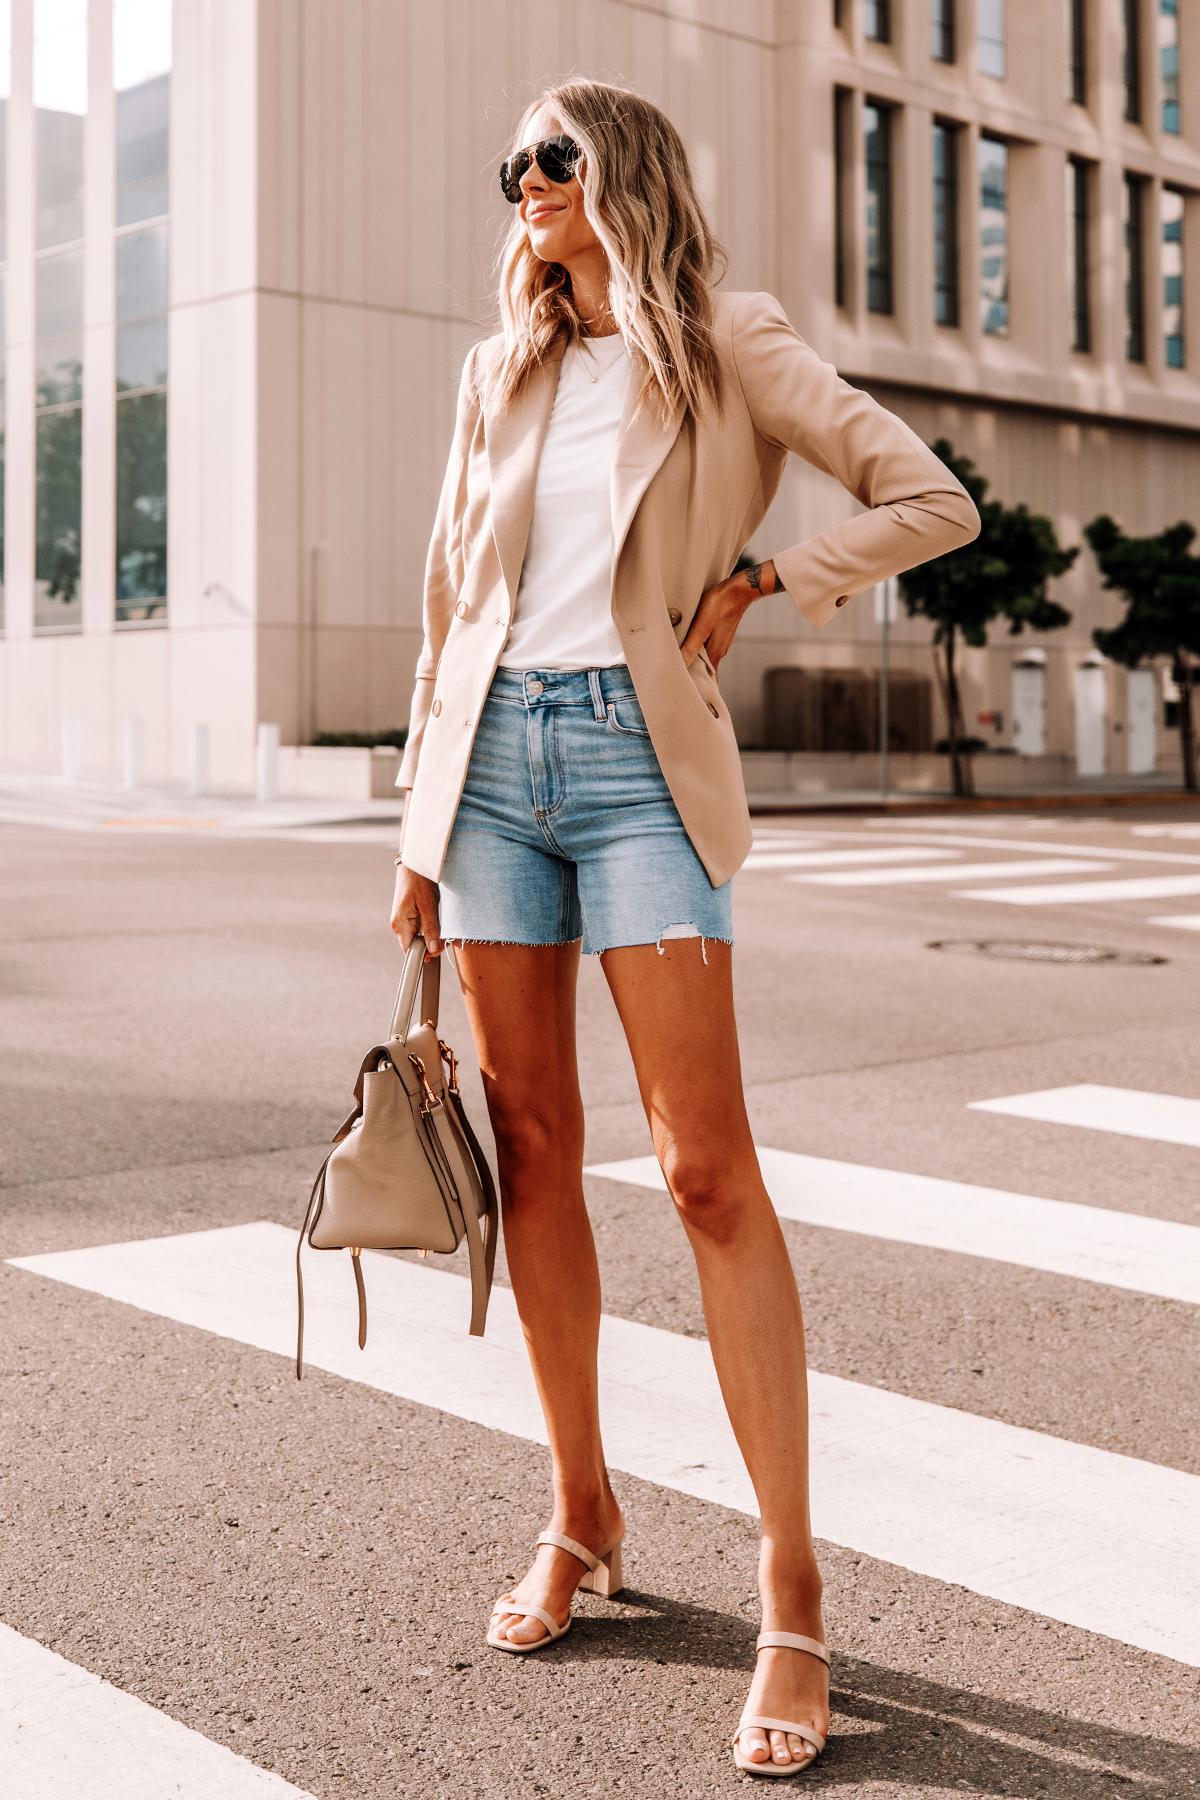 Fashion Jackson Wearing Tan Blazer White Tshirt Raw Hem Denim Shorts Tan Sandals Celine Belt Bag